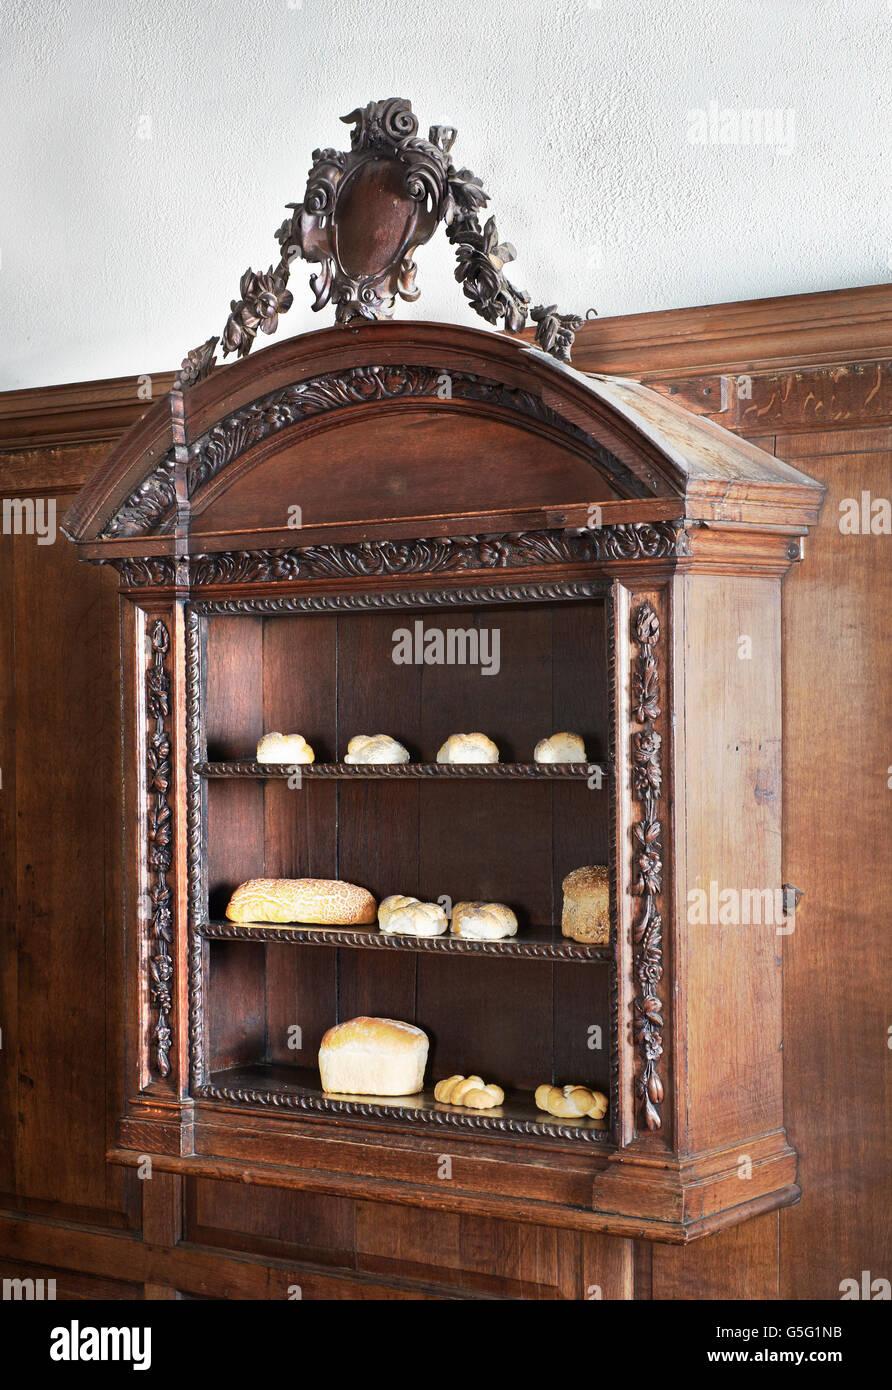 All Hallows Twickenham, formerly All Hallows Lombard Street:  Bread shelves - Stock Image